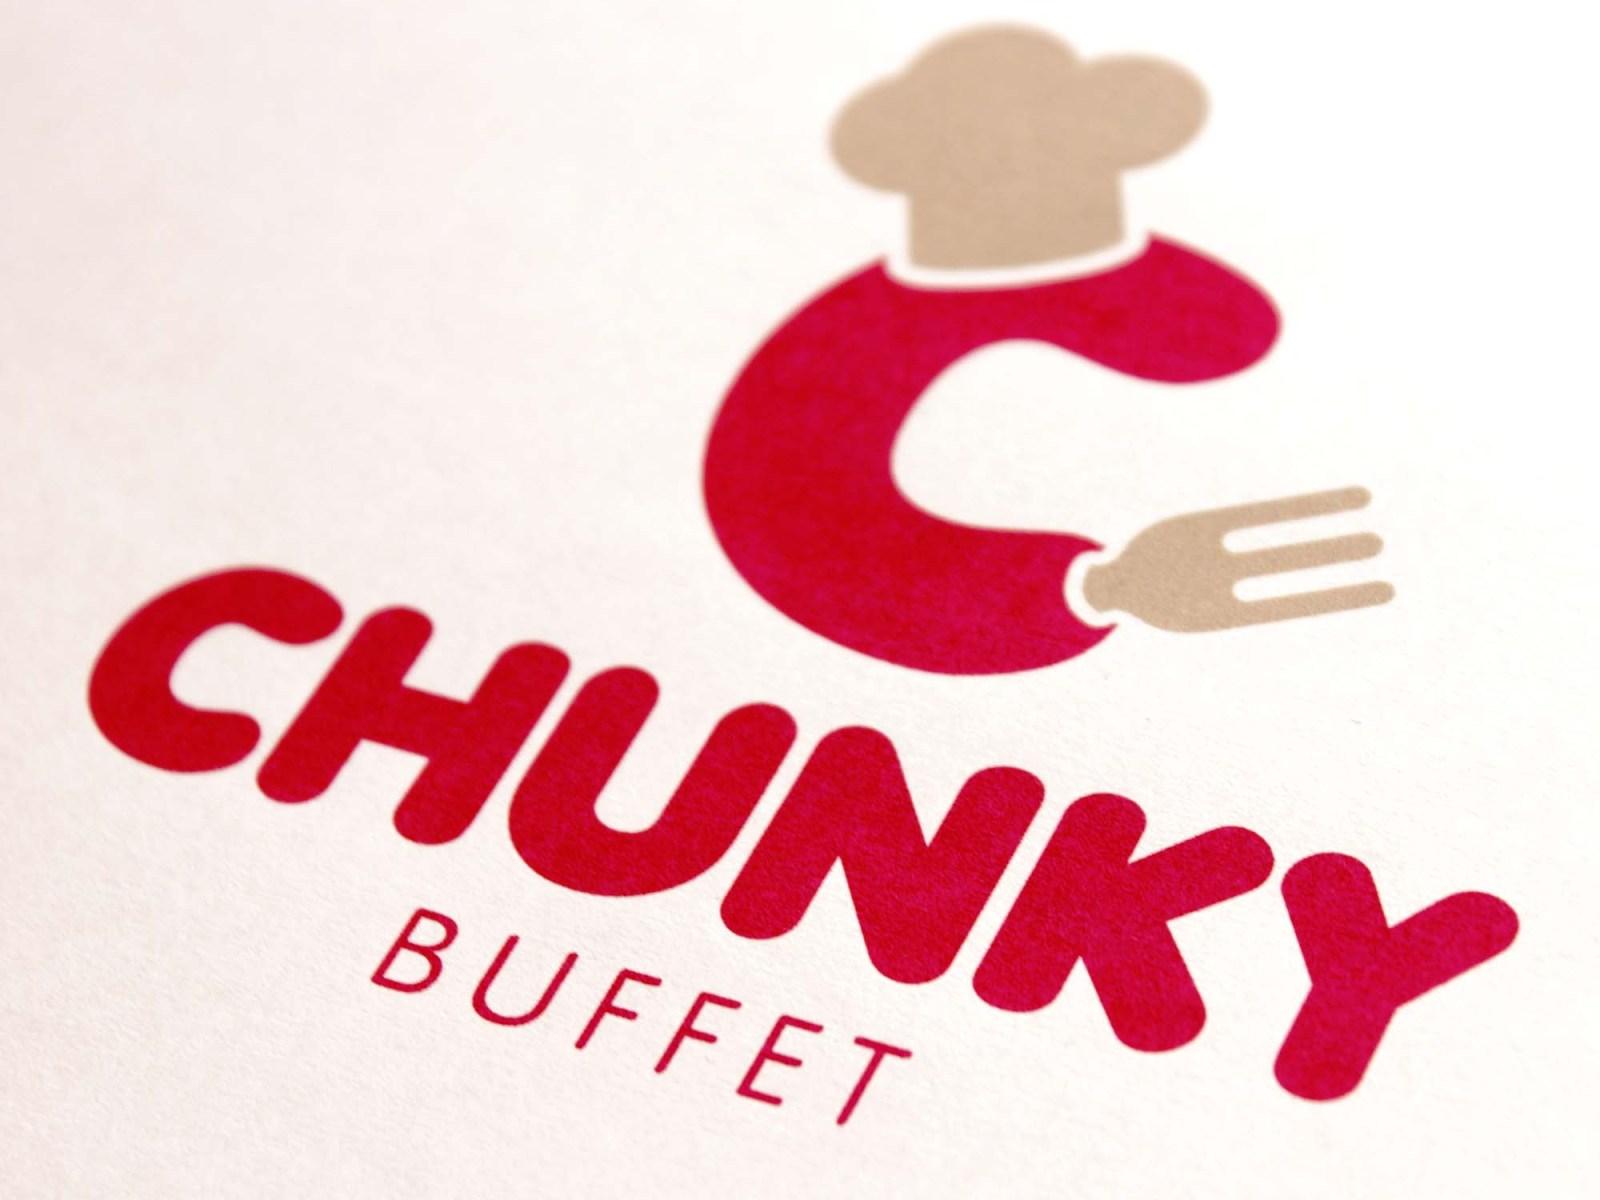 Chunky-Buffet-logo_0001_Layer 16